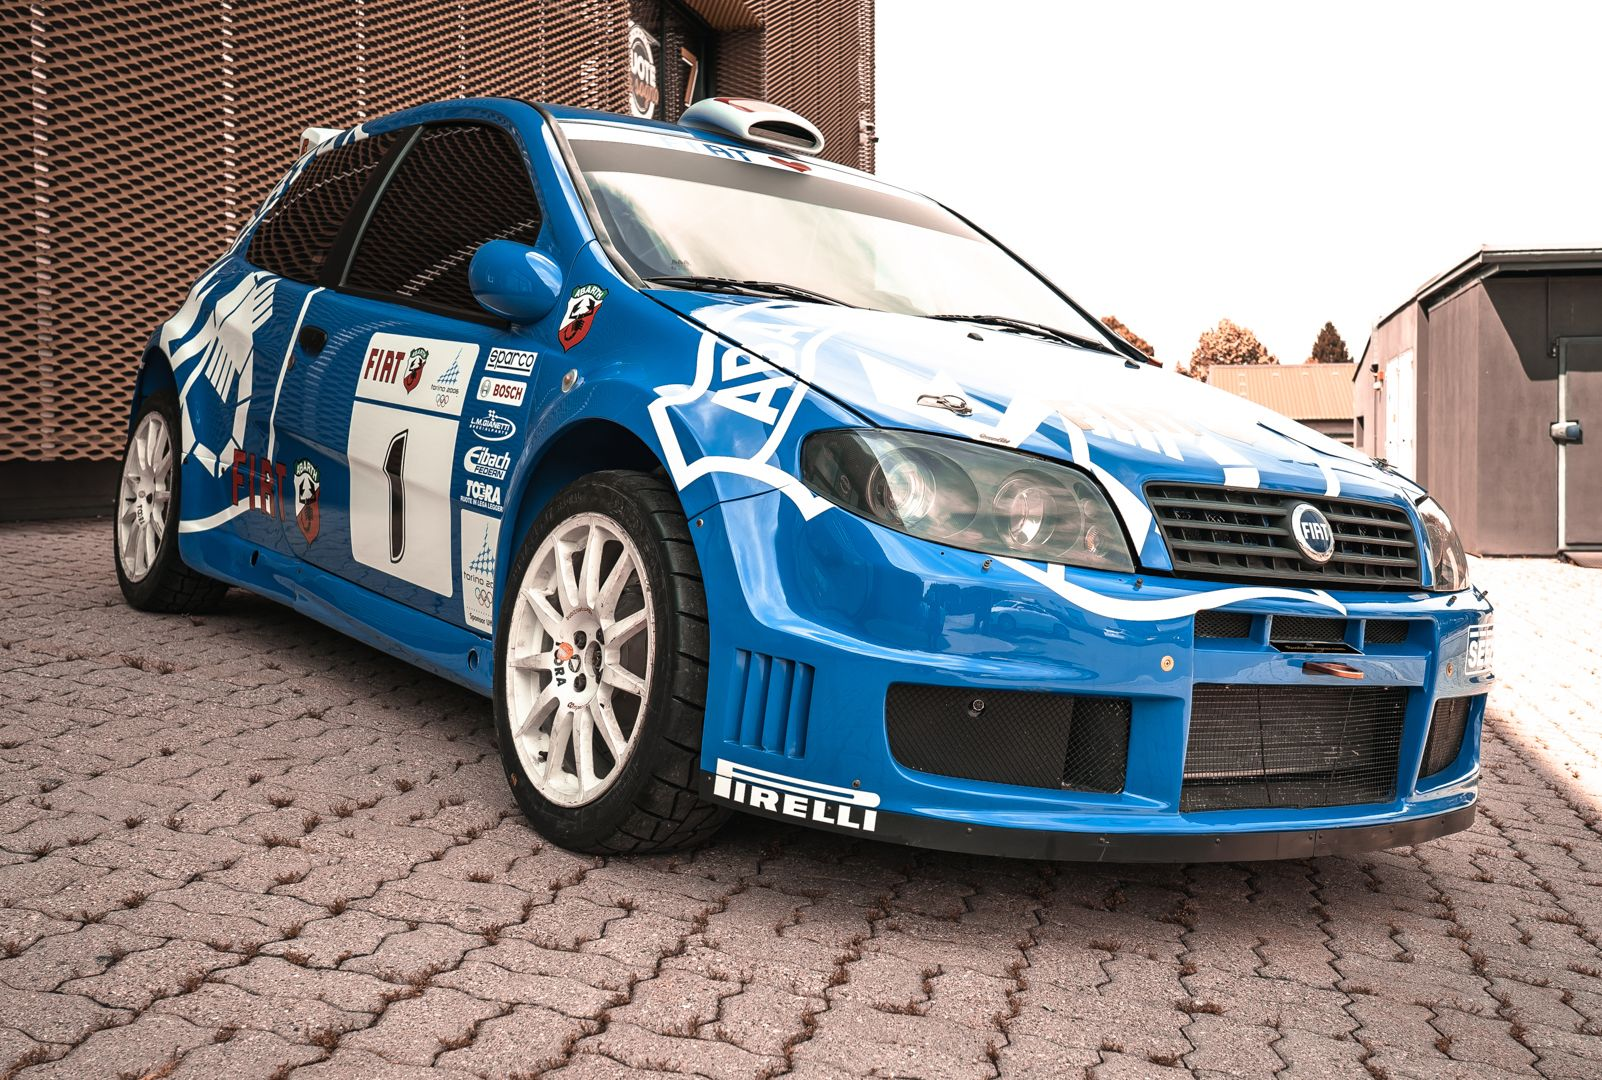 2004 Fiat Punto S1600 Rally 76542